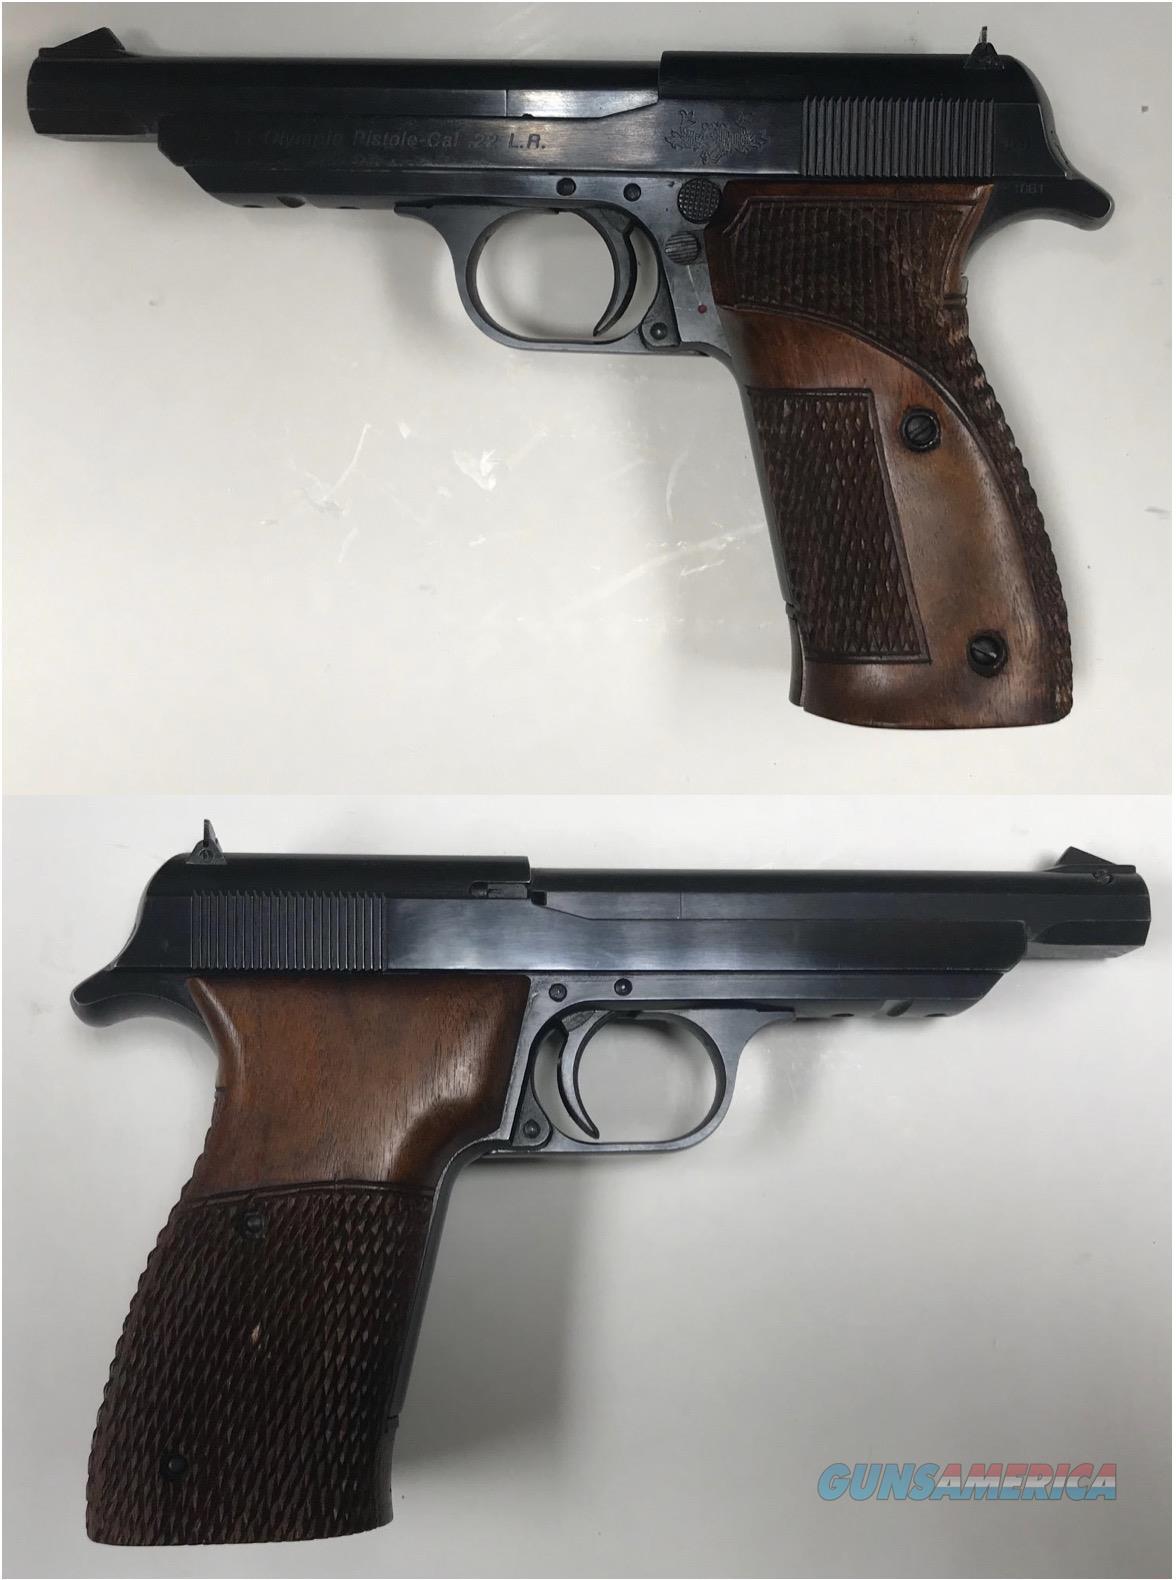 Norinco TT Olympia .22LR Copy of 1936 Walther Olympic pistol  Guns > Pistols > Norinco Pistols